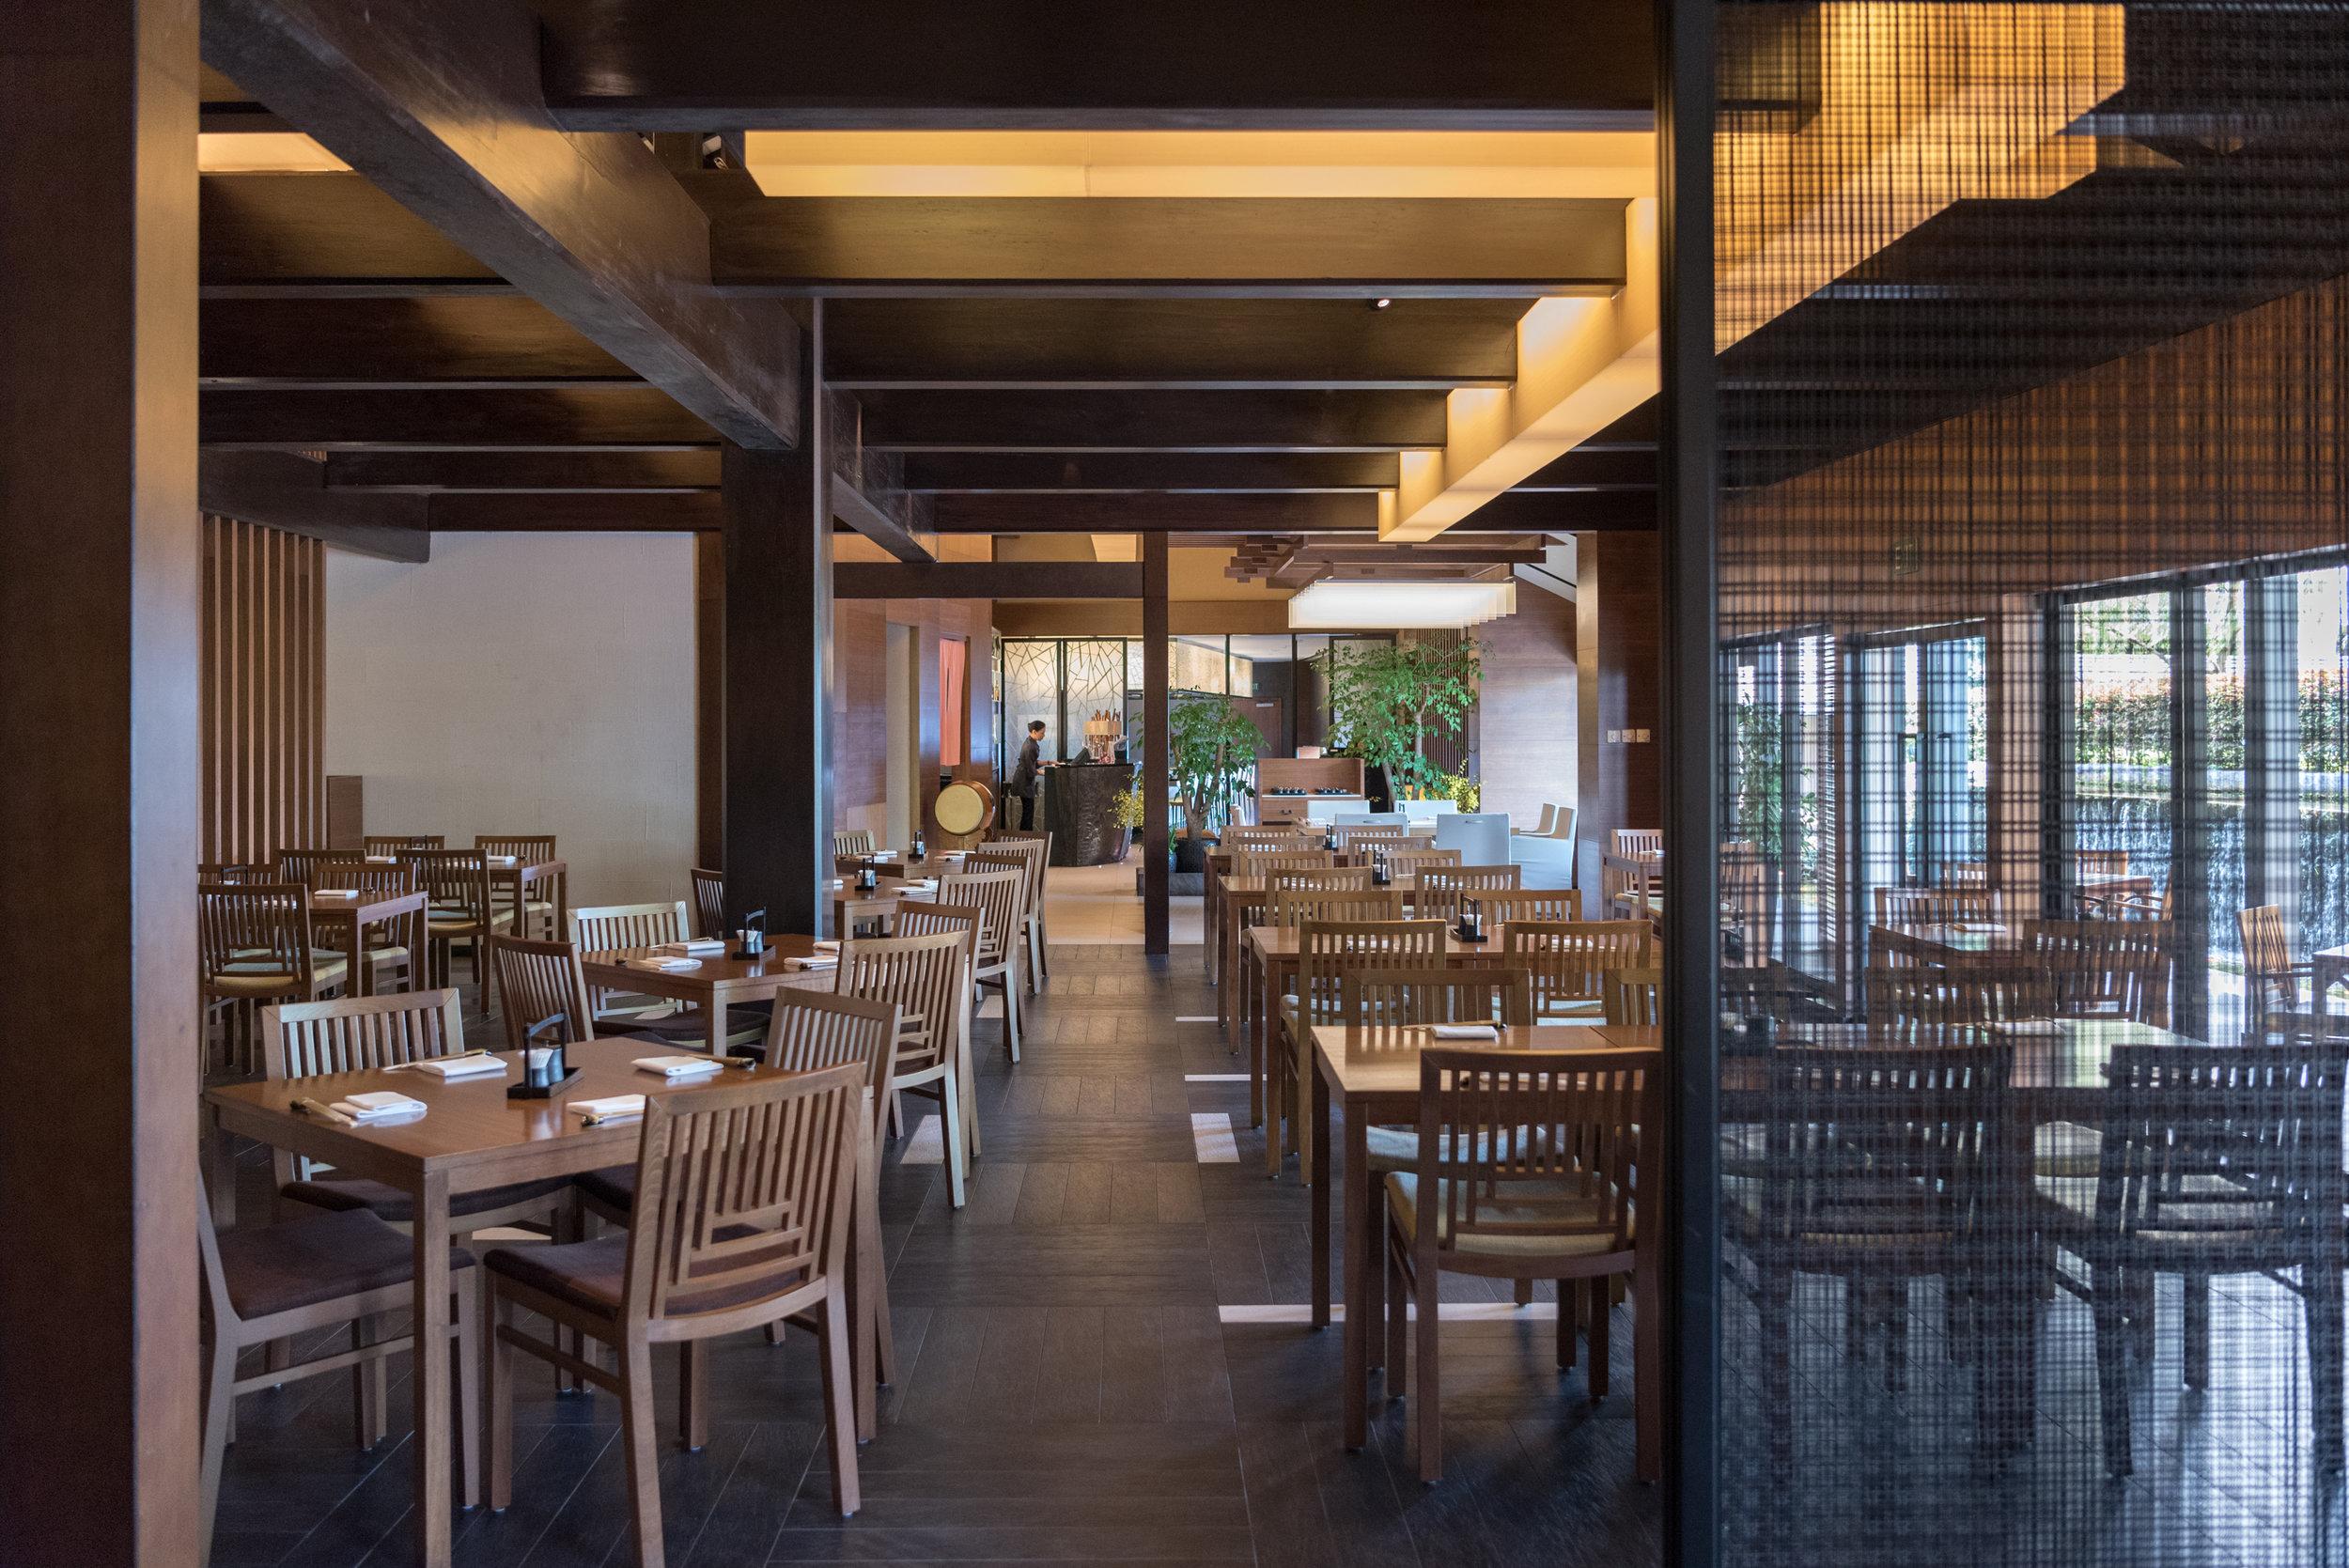 Restaurant Interiors  Keyaki - Pan Pacific Singapore